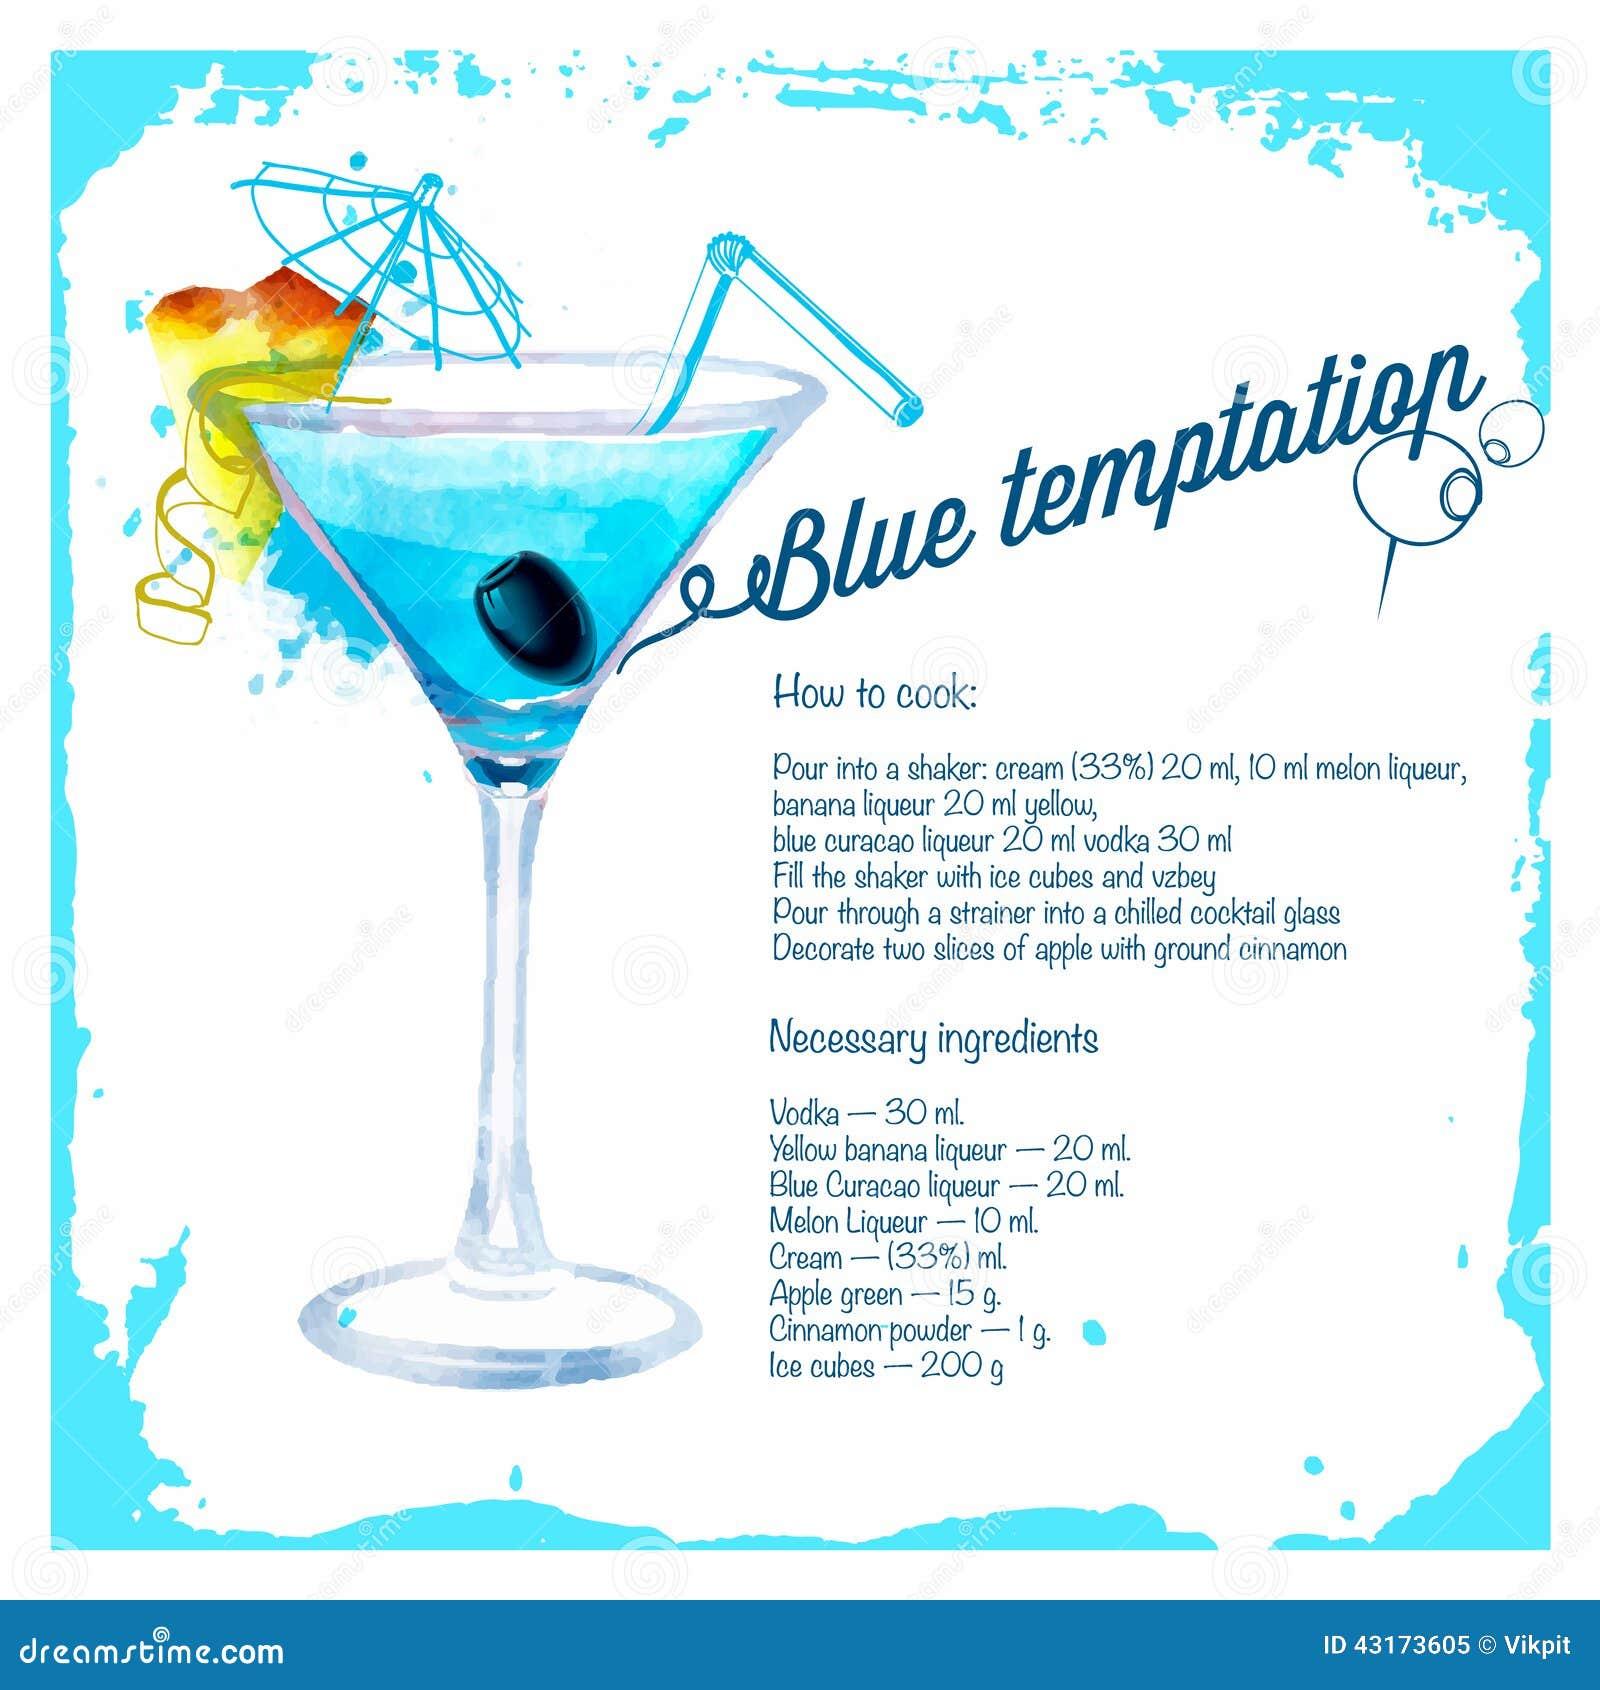 Blaue gezeichnetes aquarell der versuchung cocktails vektor abbildung bild 43173605 - De scandinavische cocktail ...